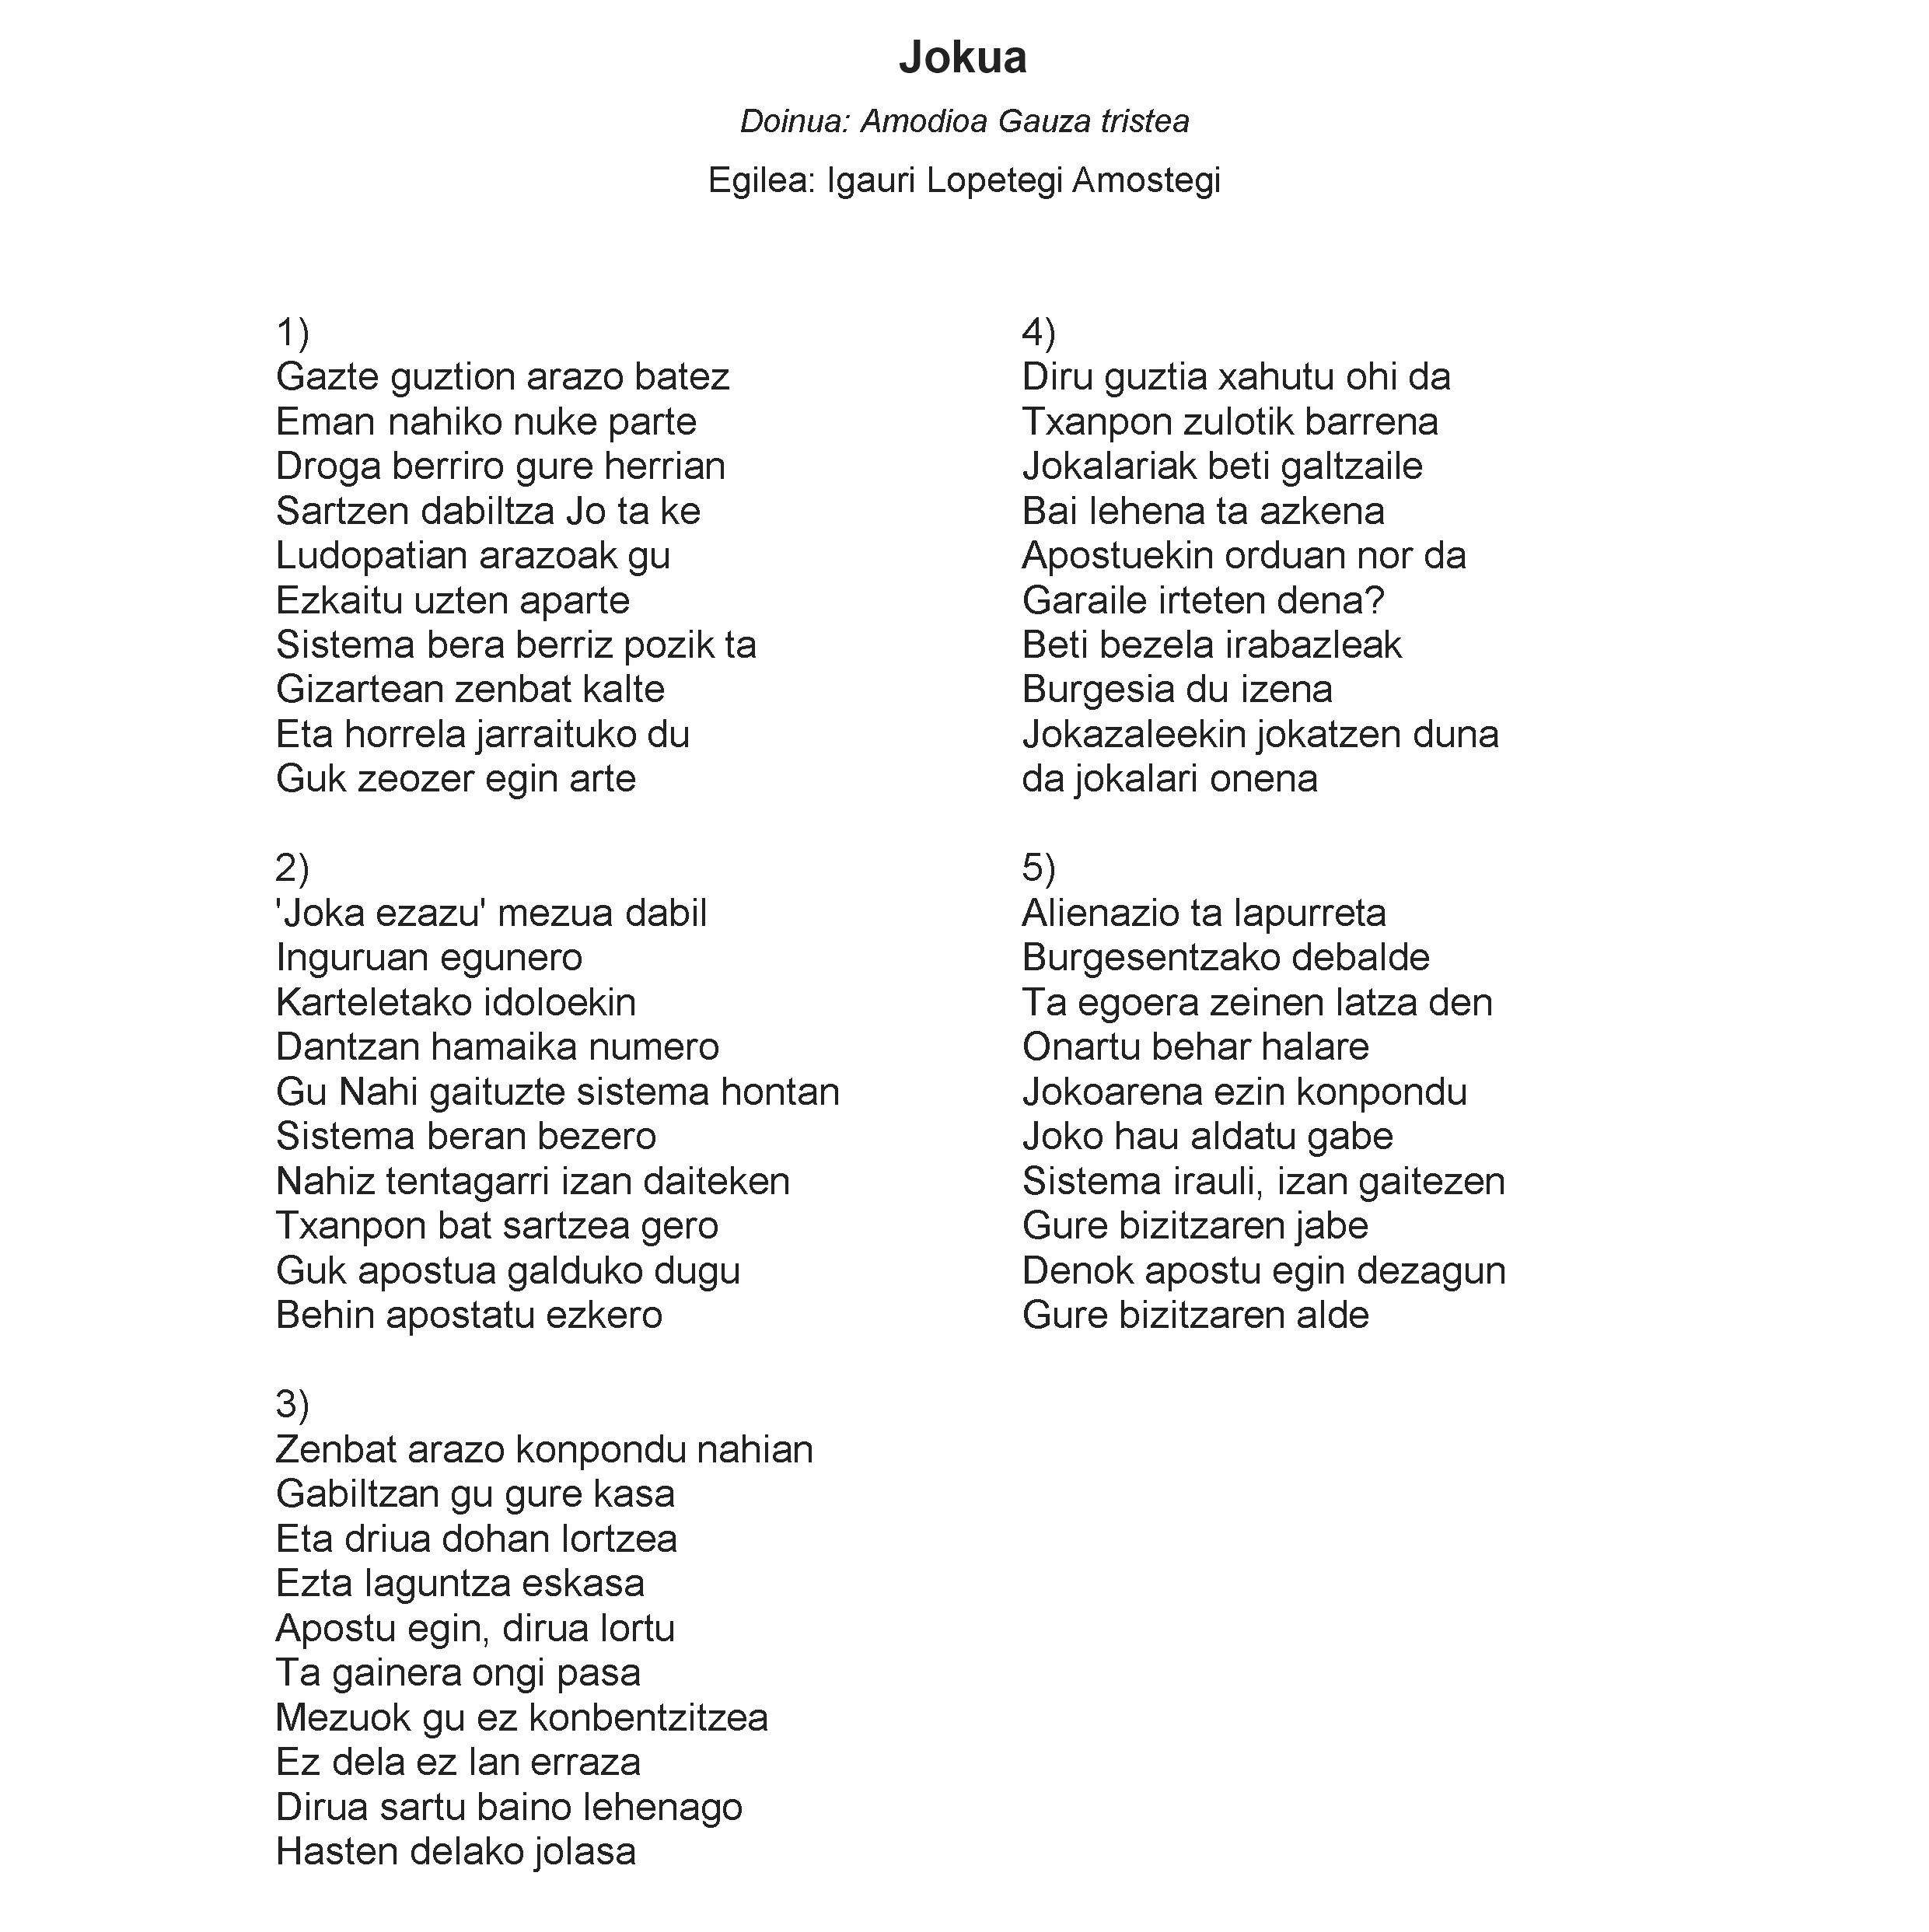 06_apirila_jokua _Igauri